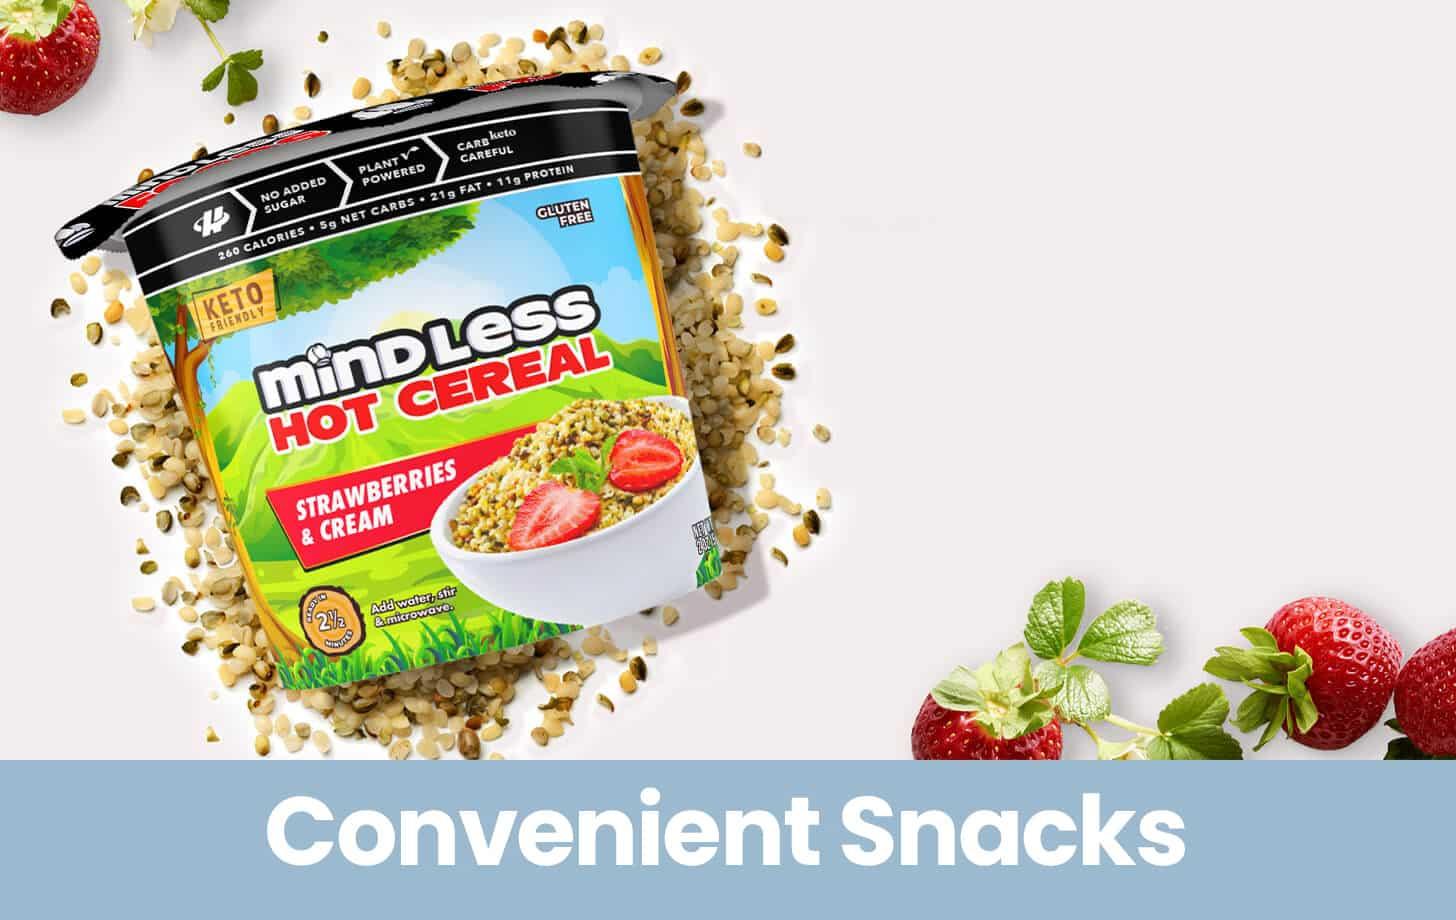 Convenient Snacks